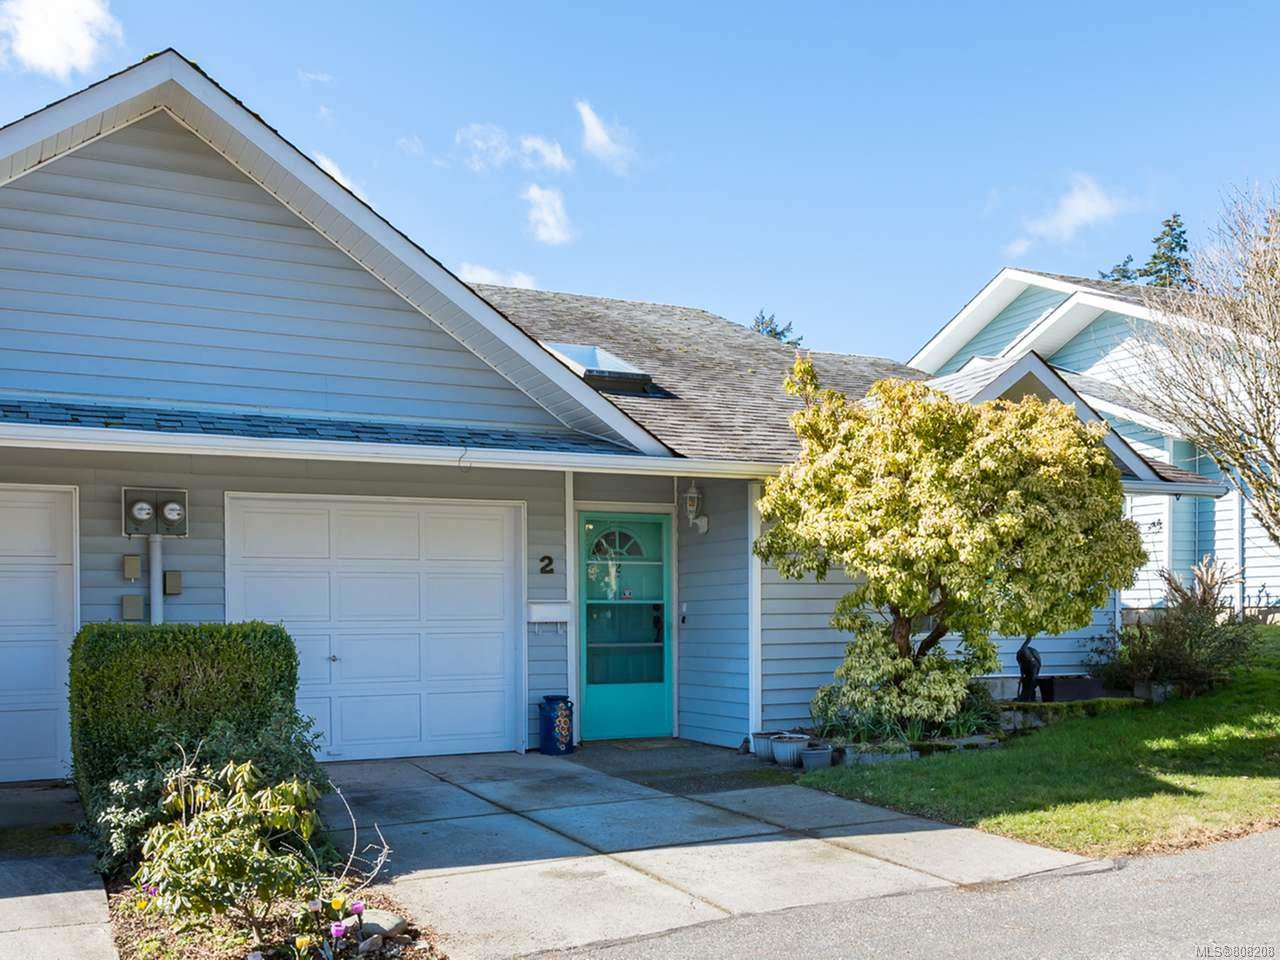 Main Photo: 2 2200 Manor Dr in COMOX: CV Comox (Town of) Row/Townhouse for sale (Comox Valley)  : MLS®# 808208